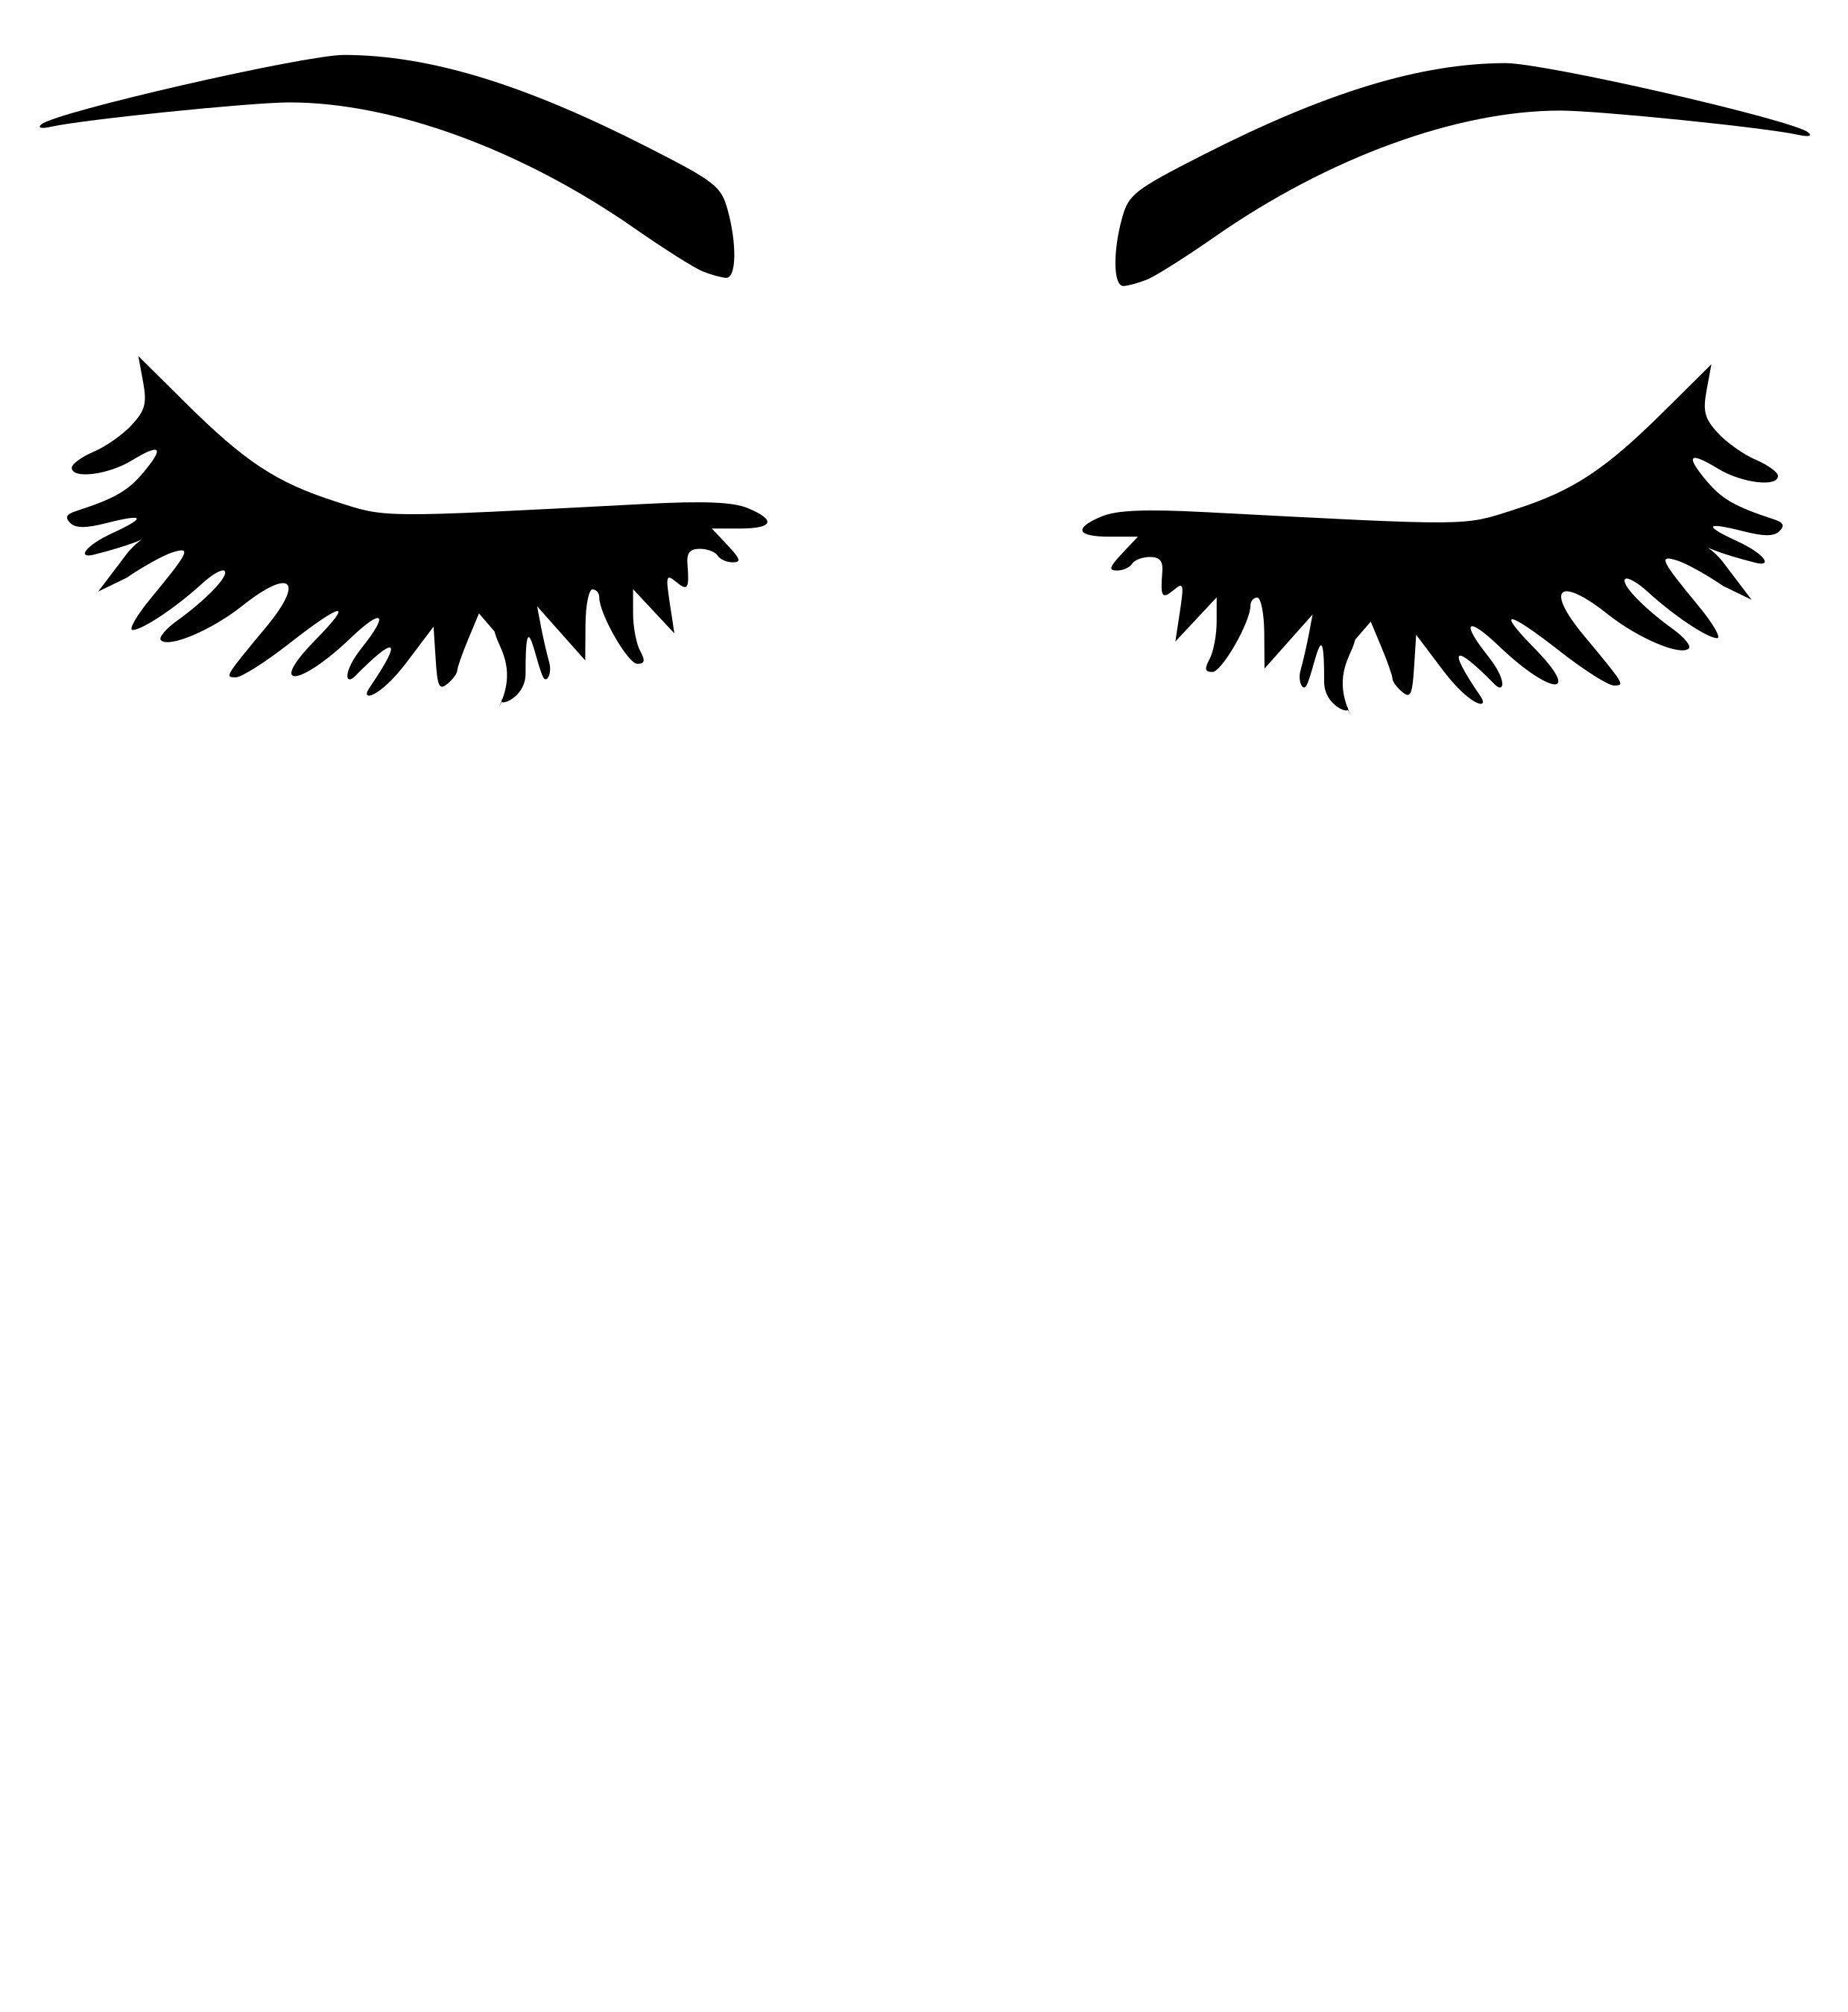 Eyelashes Lash Technician Lash Extensions Eyebrows By Cityvinyl On Etsy Eyelashes Drawing How To Draw Eyelashes Eyelashes